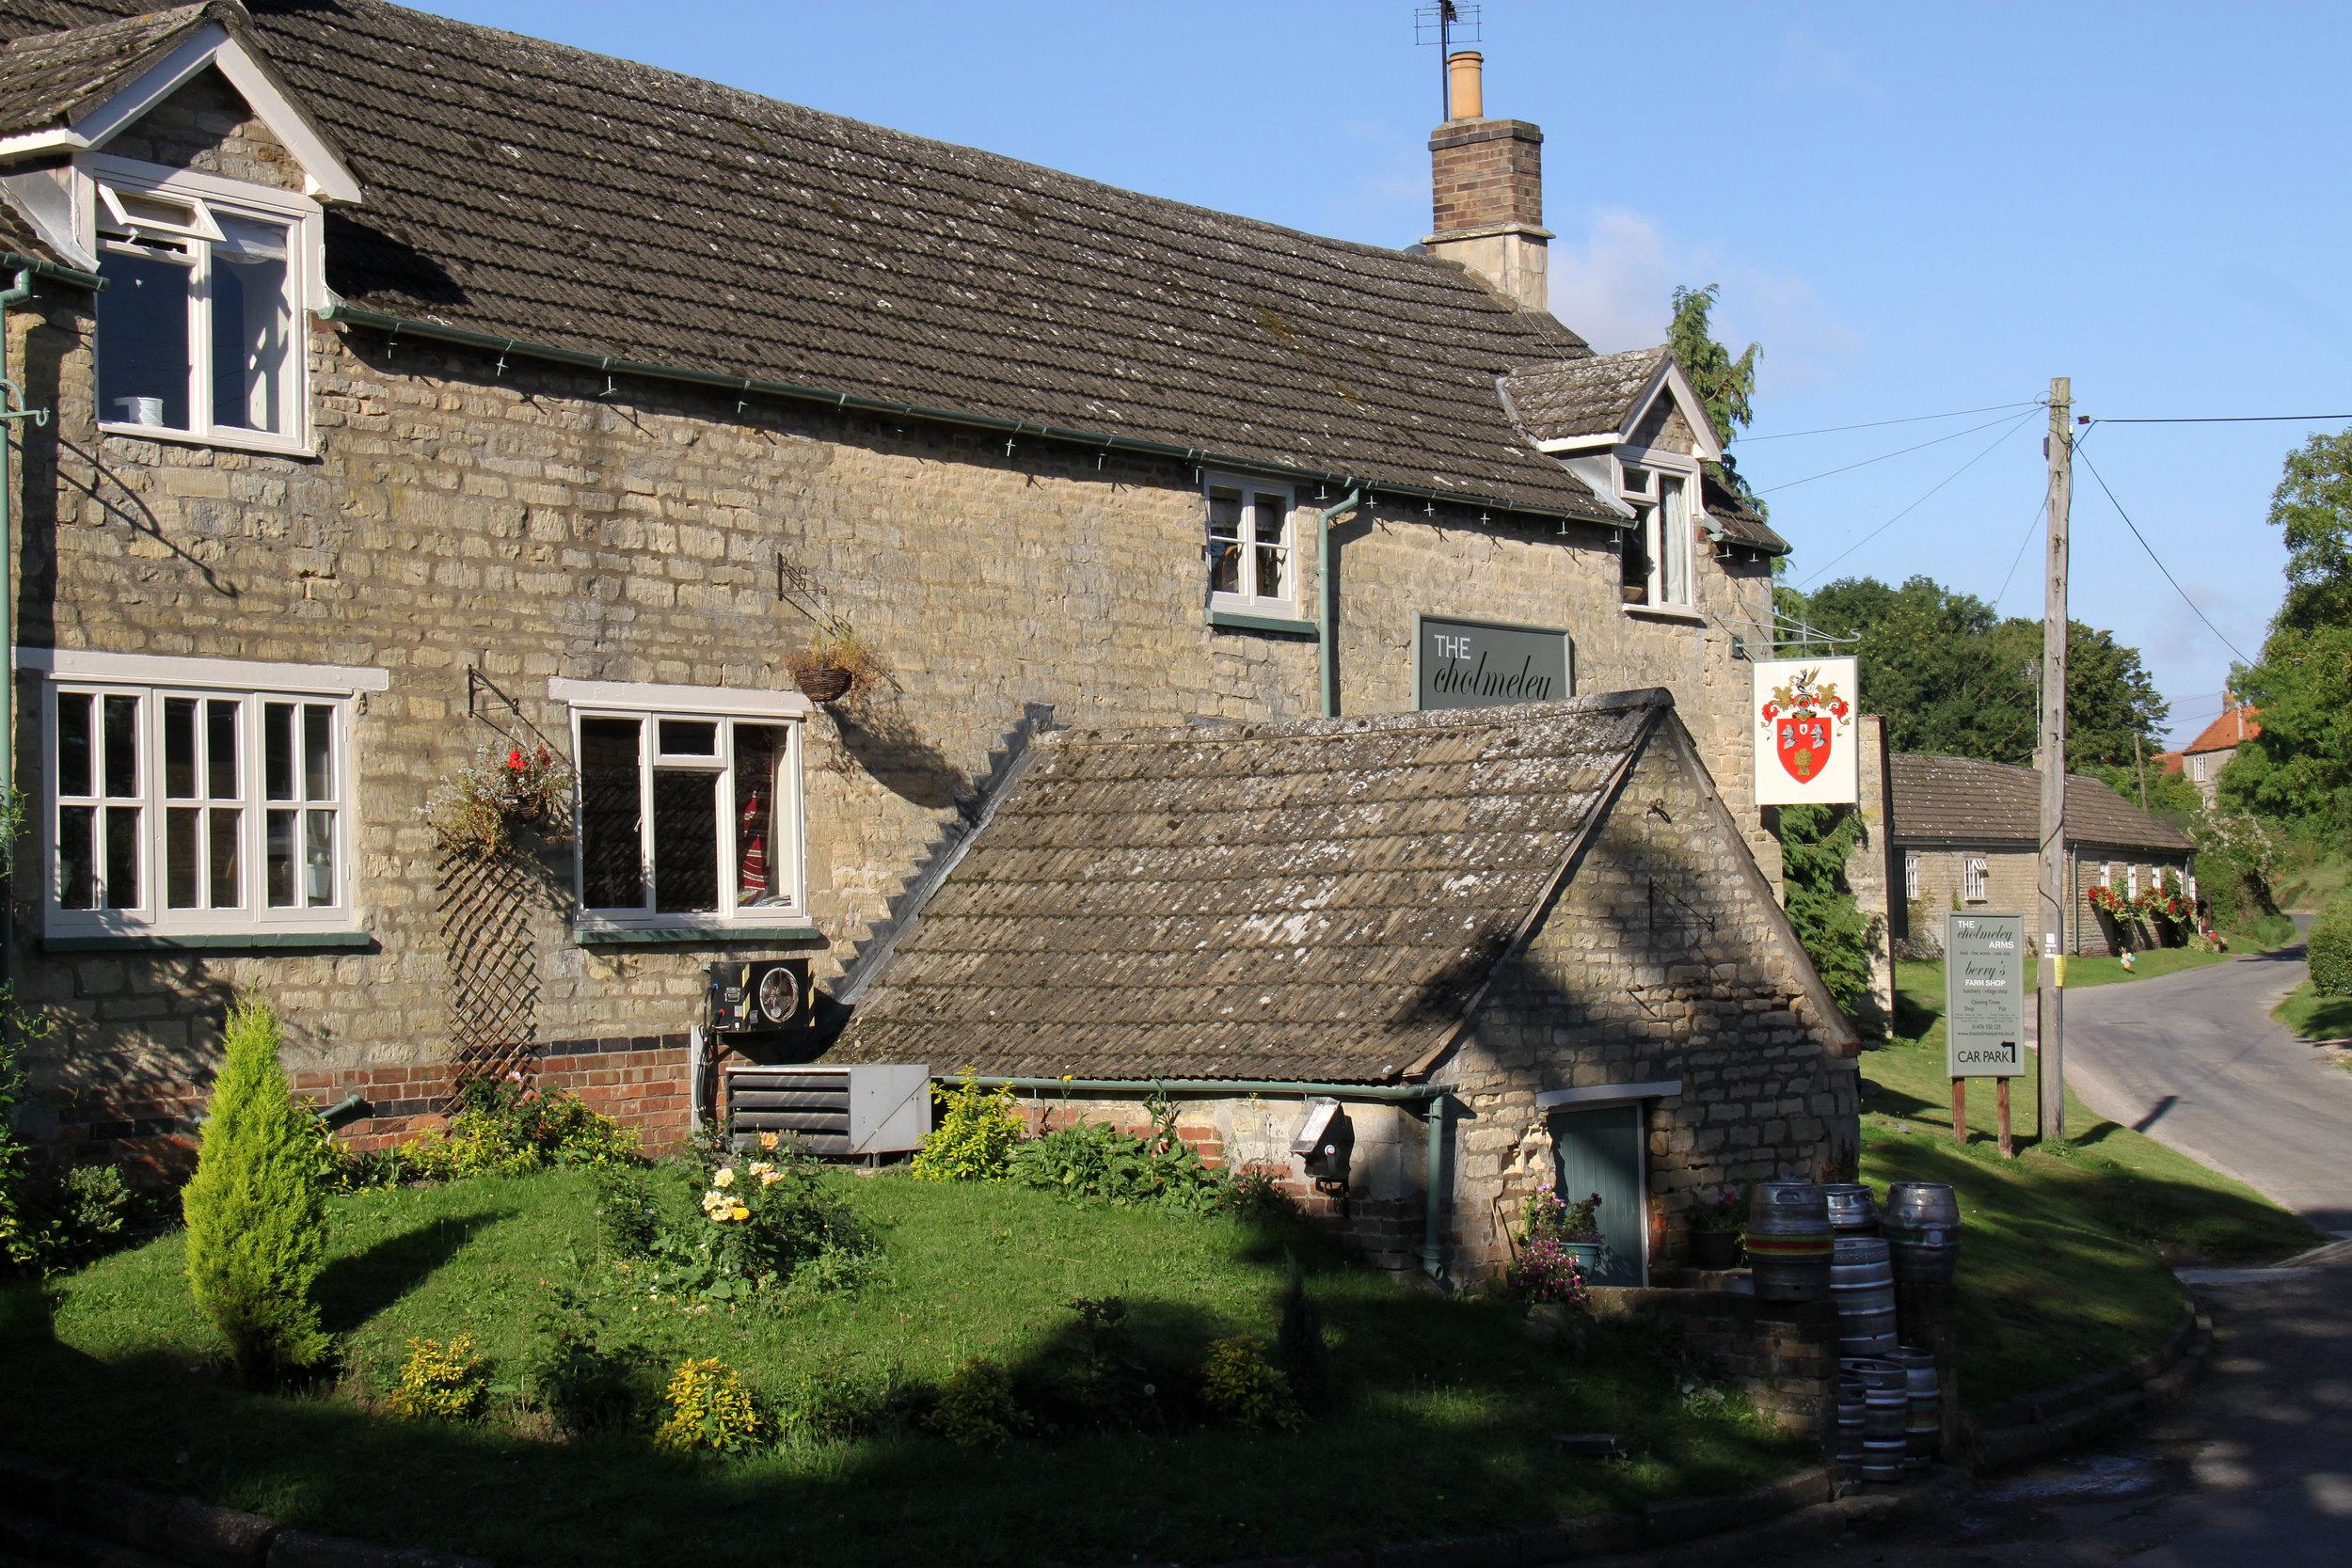 The Cholmeley Arms, Burton-le-Coggles